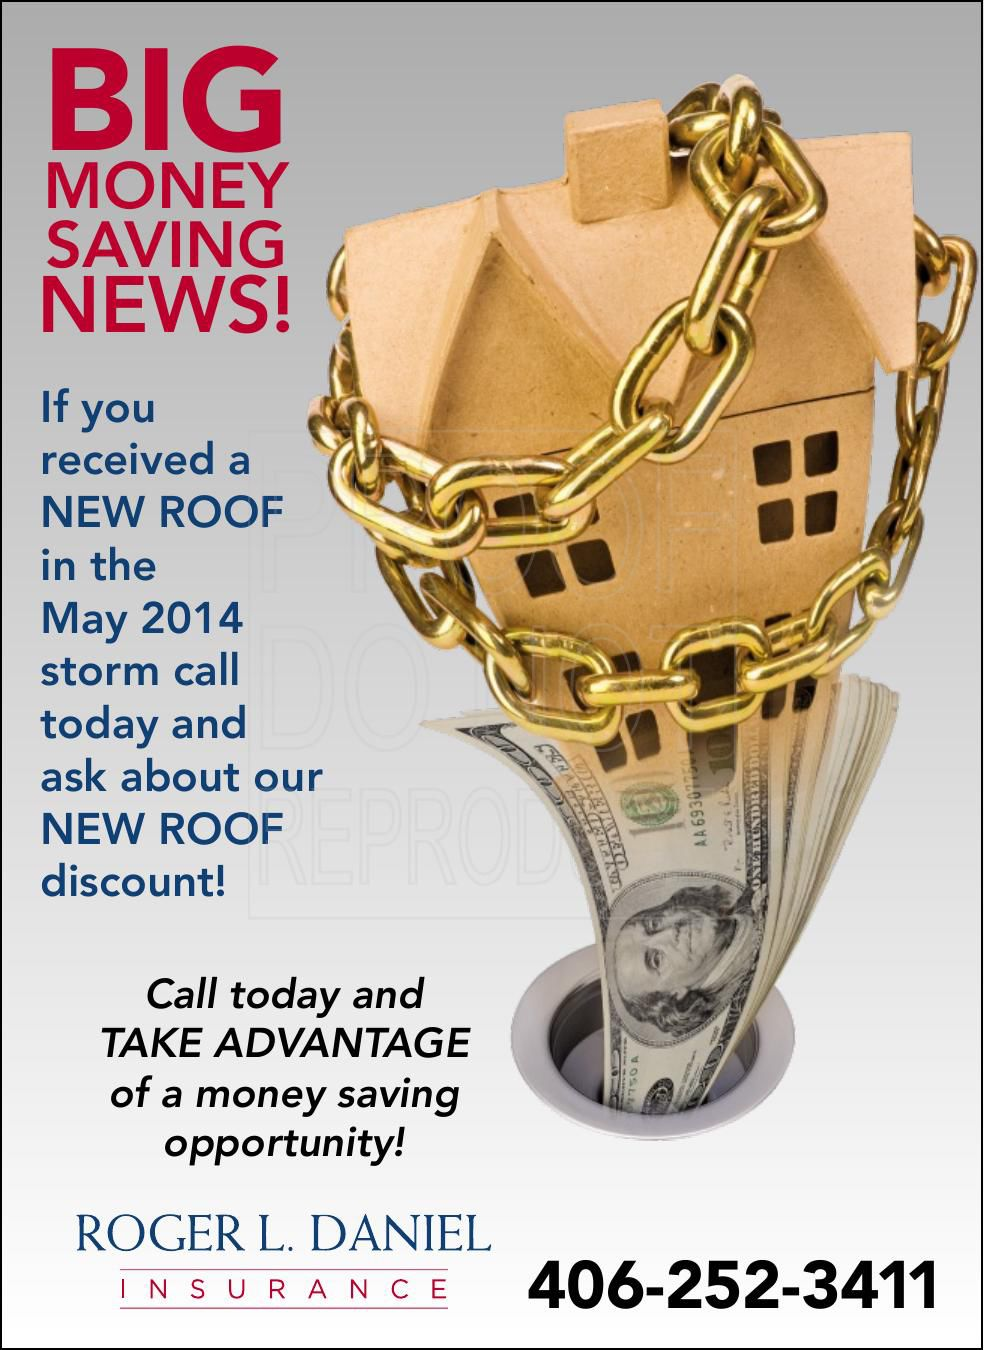 Big Money Saving News!